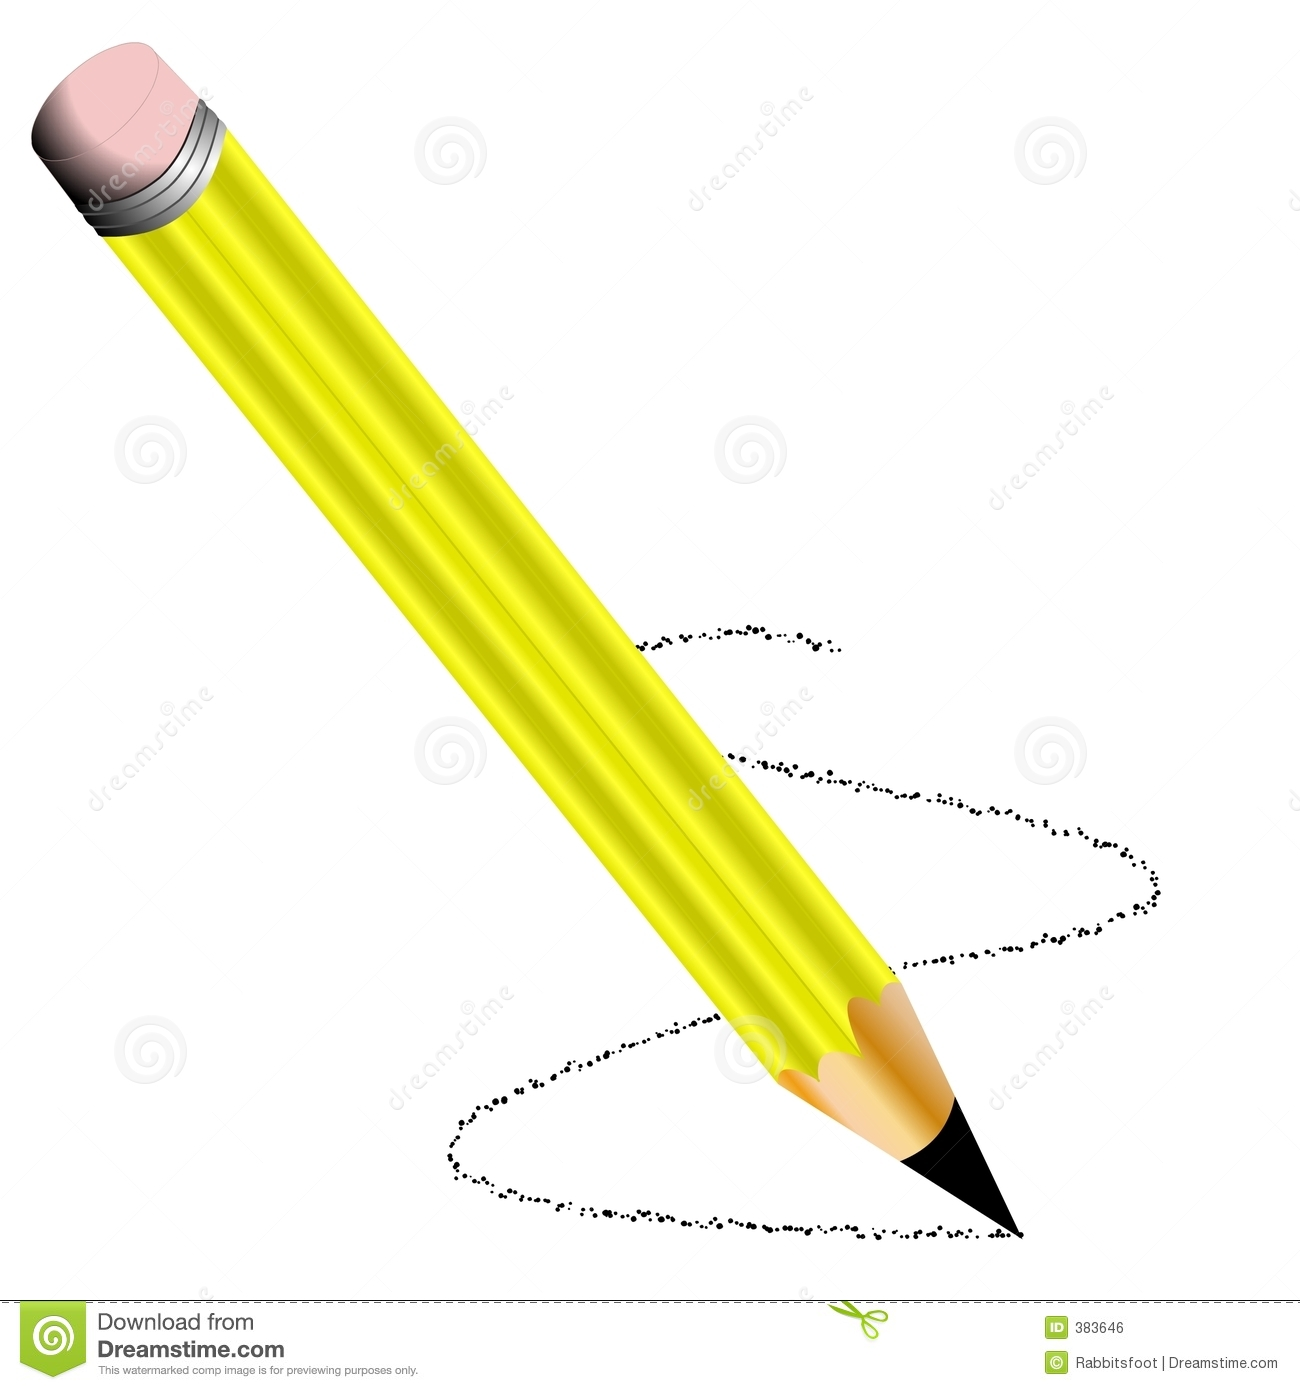 Sharp pencil clipart 2 » Clipart Station.